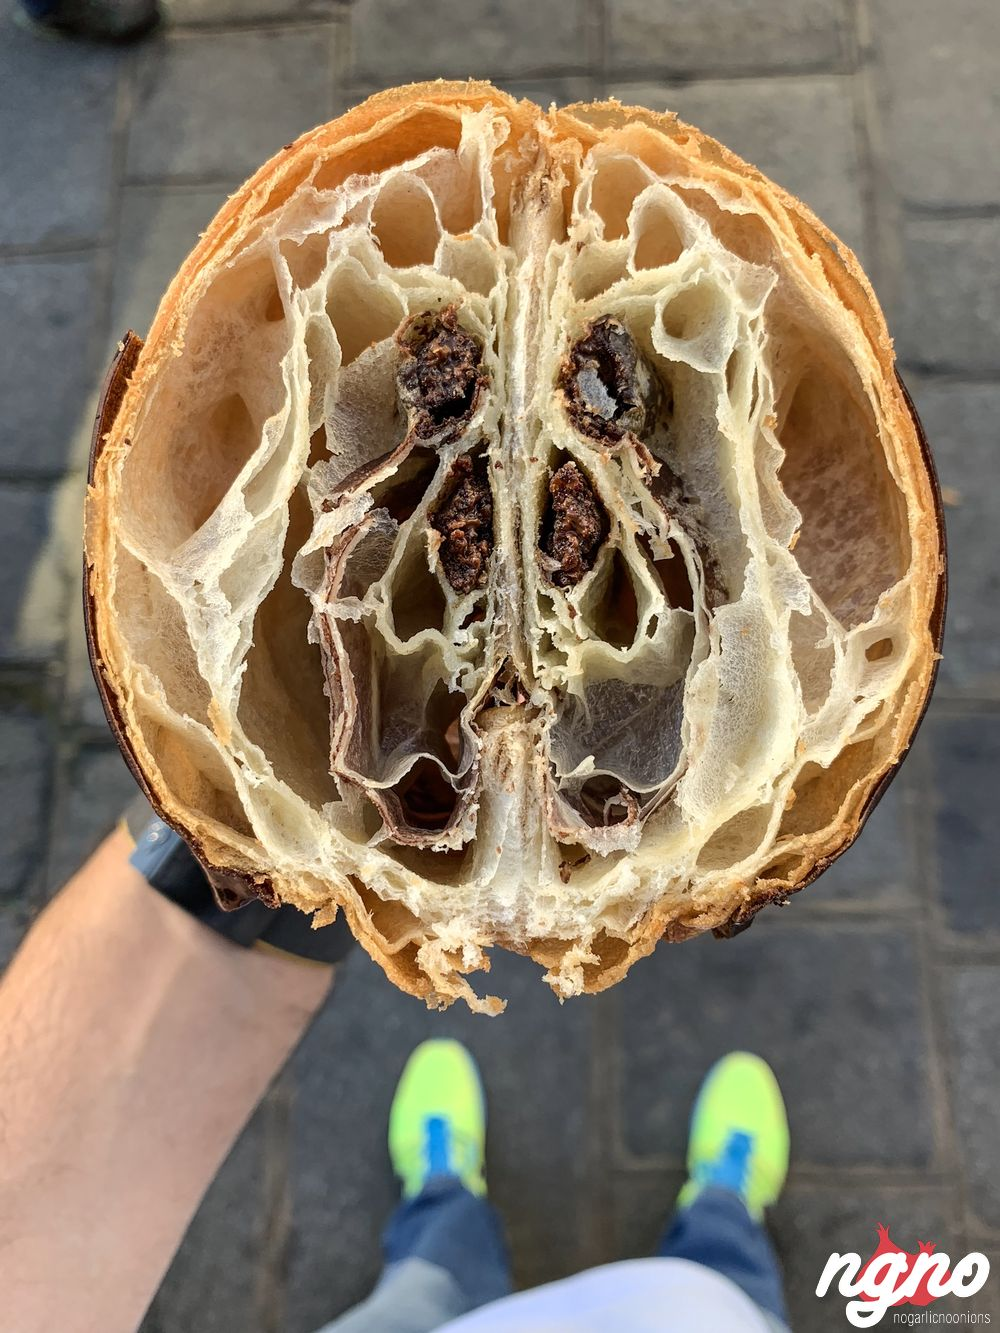 bo-mie-bakery-pastry-paris-nogarlicnoonions-212018-10-13-06-47-39